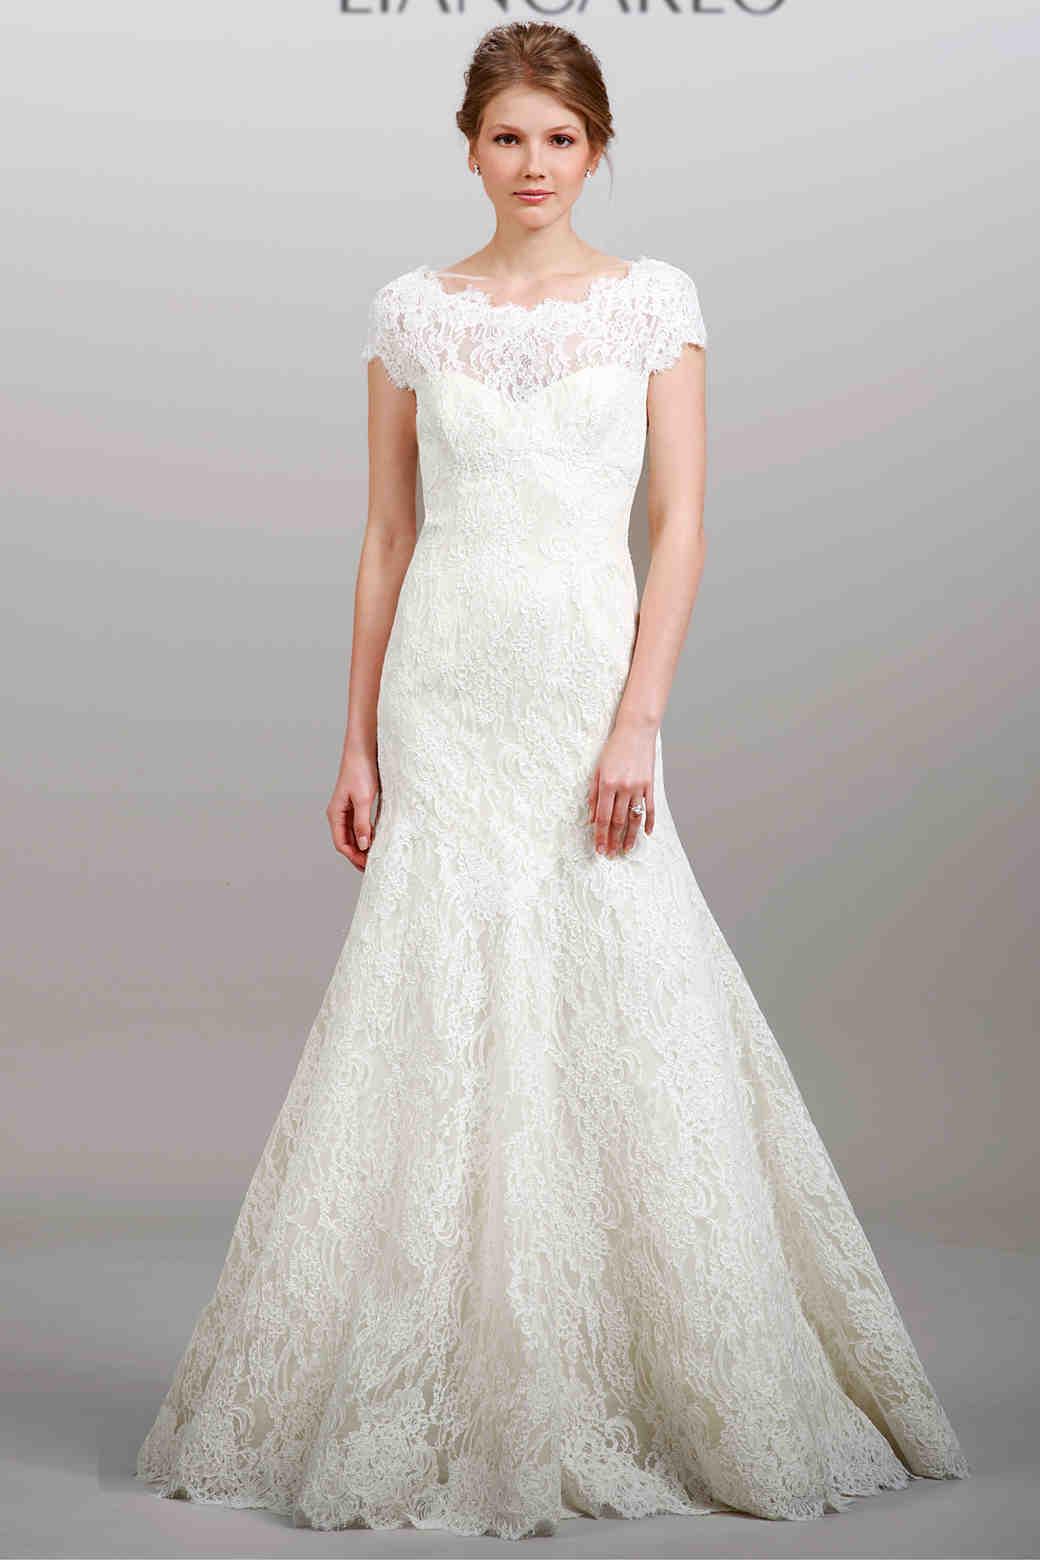 Illusion wedding dresses spring 2014 martha stewart weddings the illusionists junglespirit Images